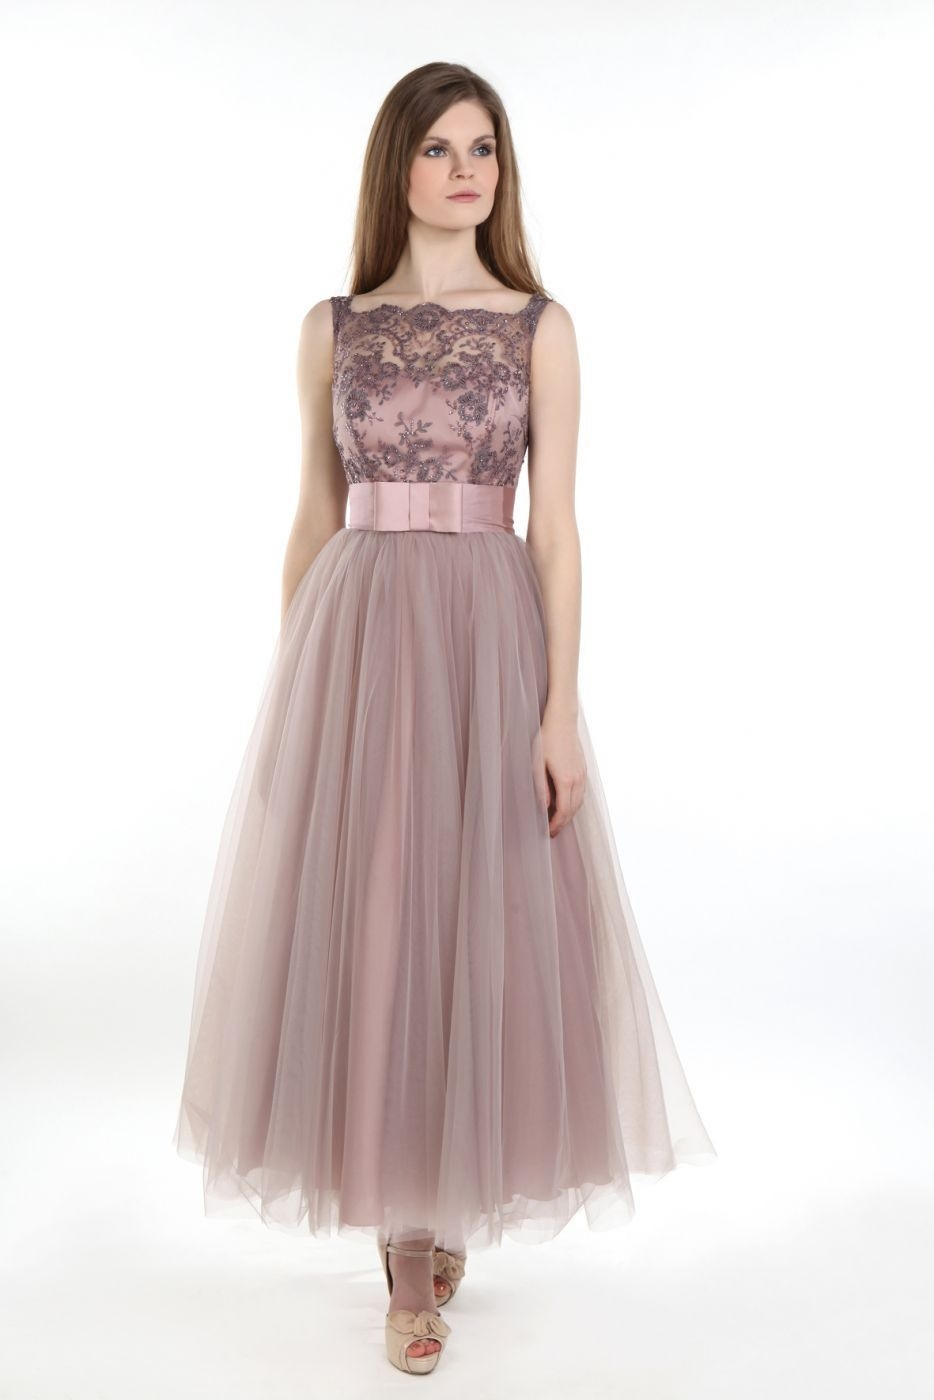 10 Spektakulär Kleid Altrosa Kurz Bester Preis10 Kreativ Kleid Altrosa Kurz Galerie